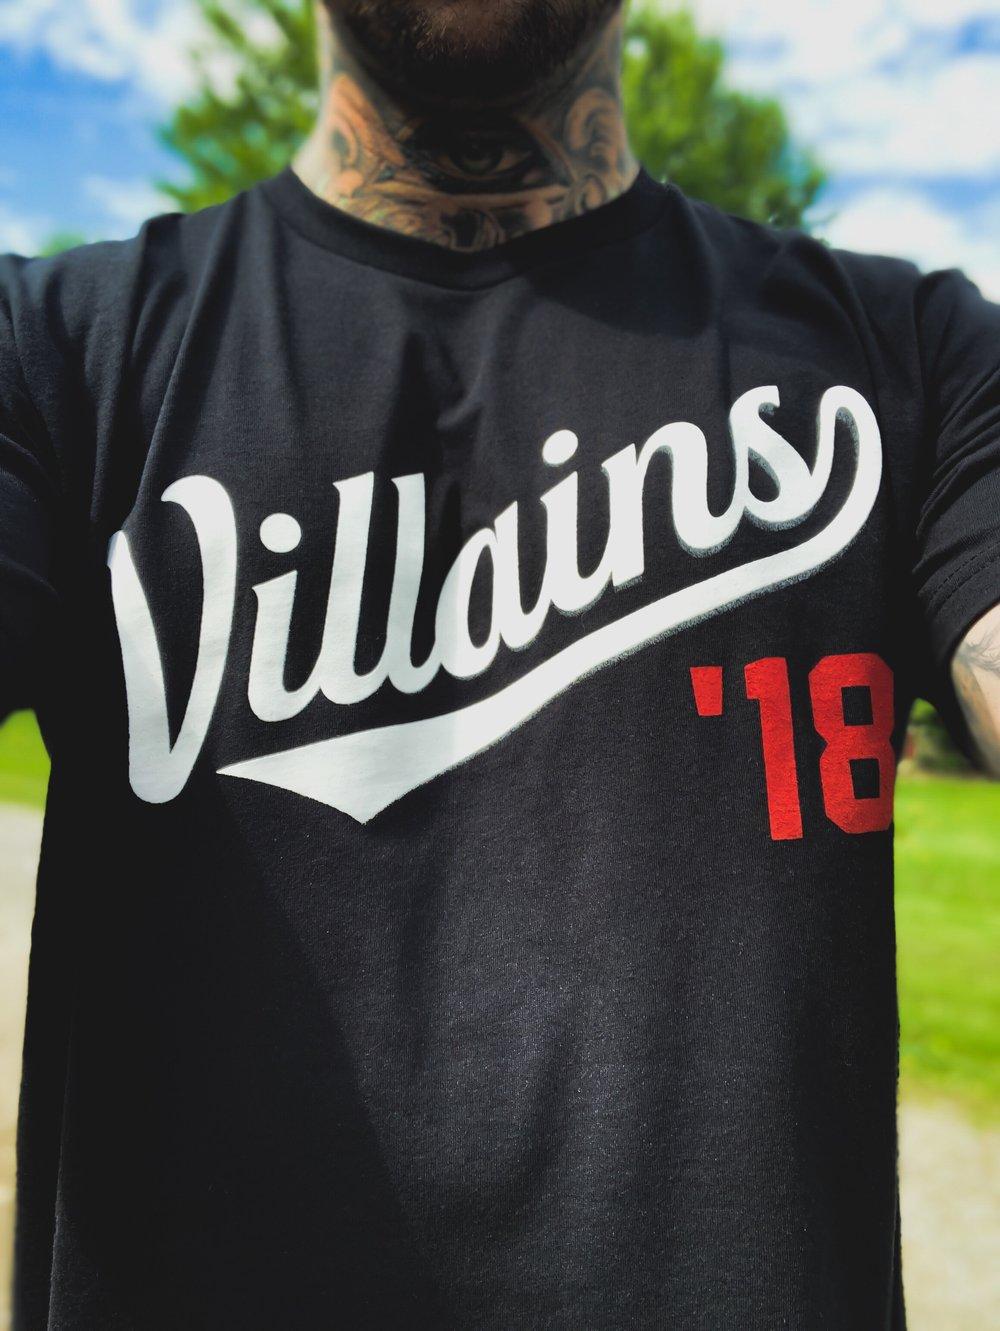 Image of Villains '18 black limited tee